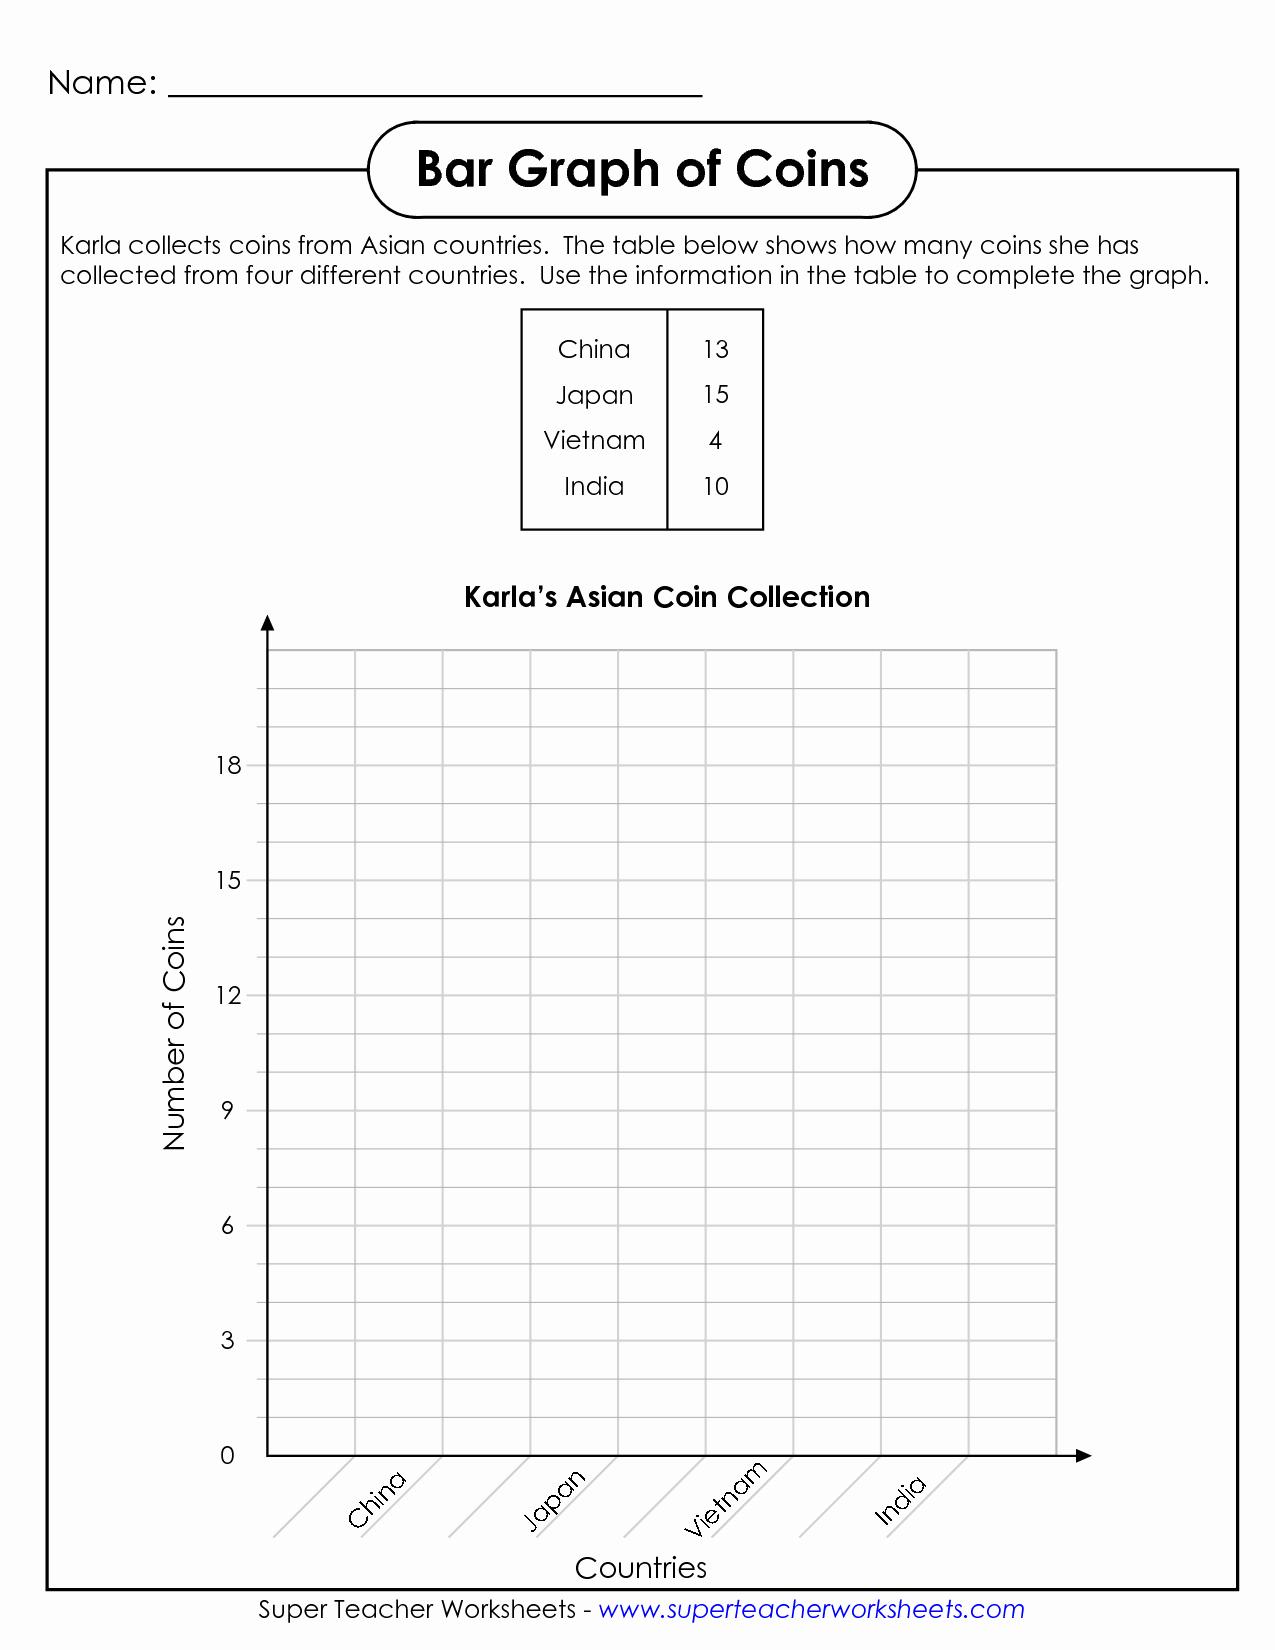 Double Bar Graphs Worksheet New 9 Best Of Super Teacher Worksheets Graphing Bar